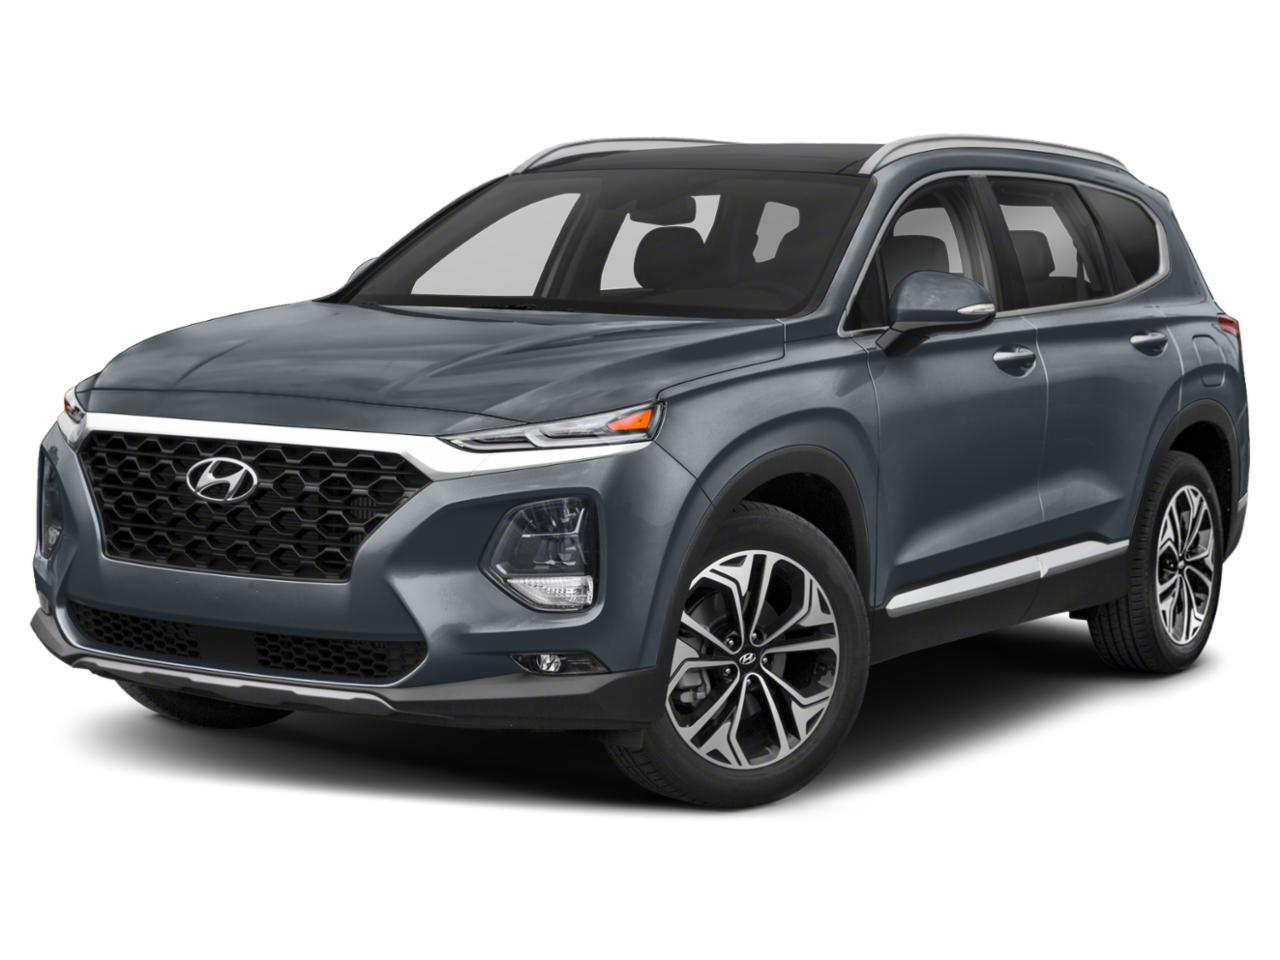 2020 Hyundai Santa Fe Vehicle Photo in Medina, OH 44256